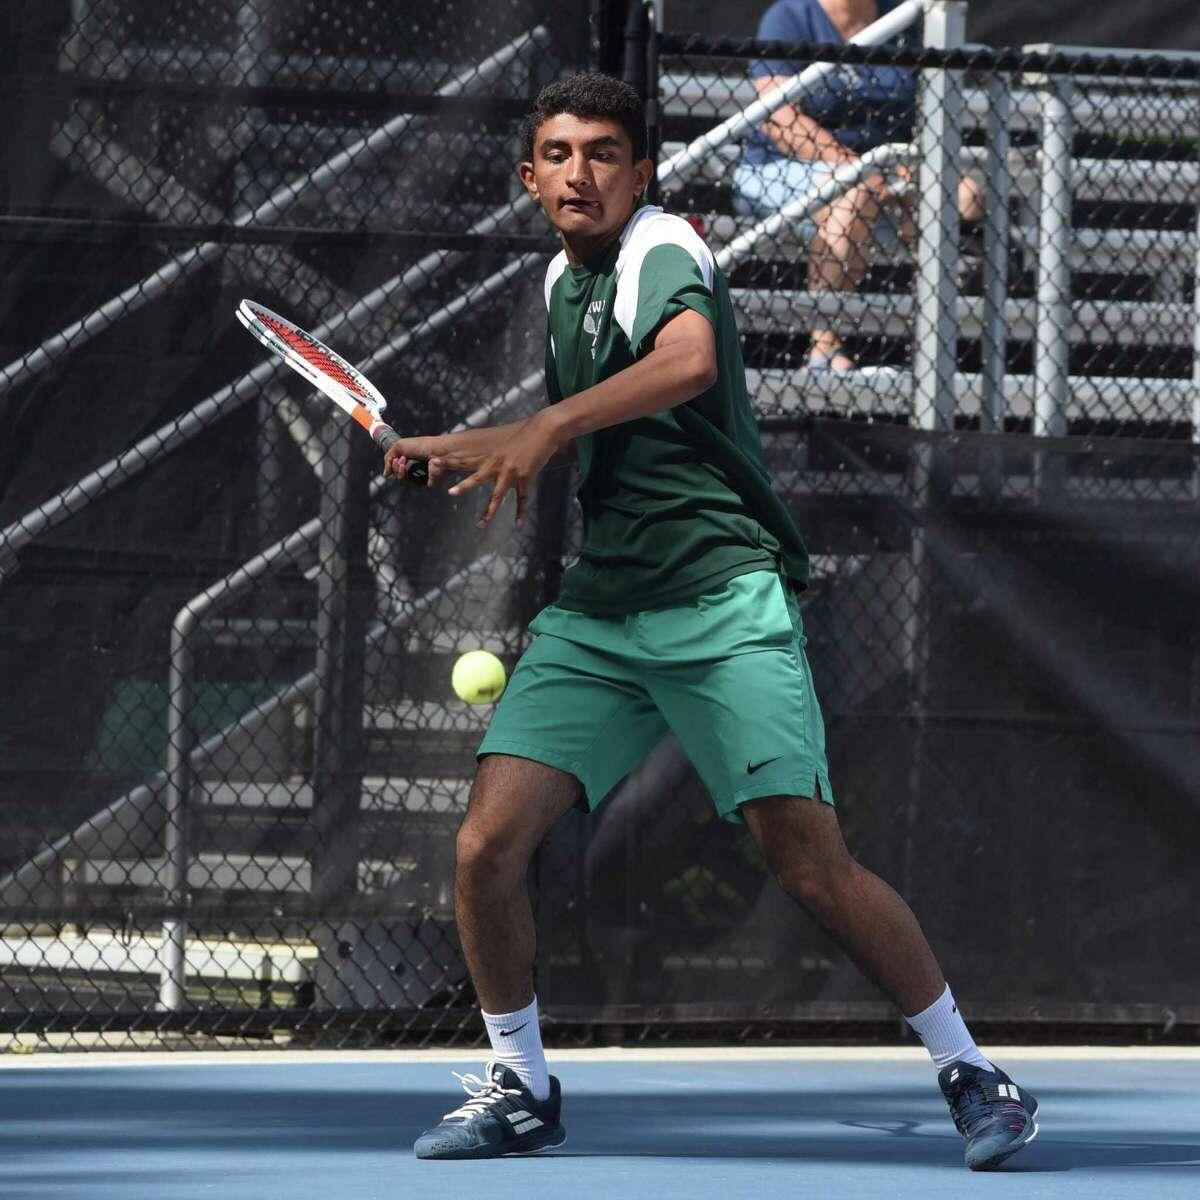 Norwalk's Prem Dave hits a return during the CIAC Boys Tennis Invitational singles championship at Weslyan University in Middletown on Thursday.